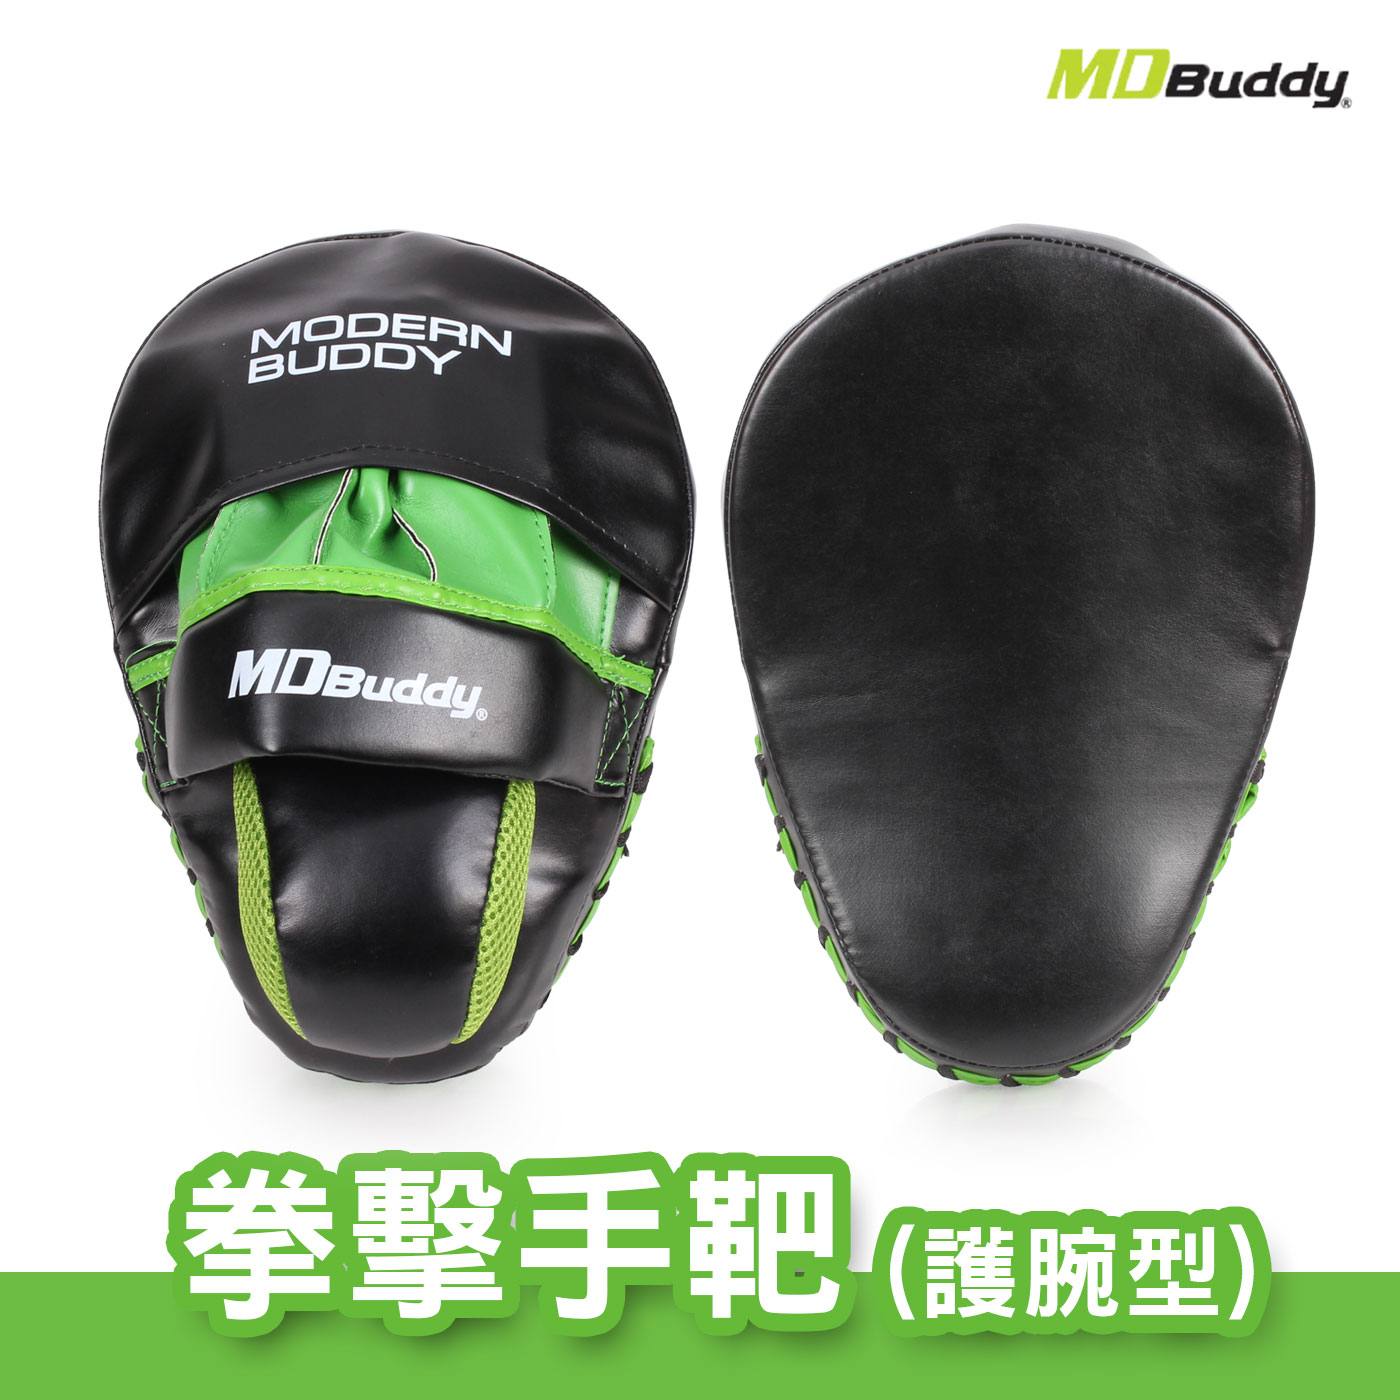 MDBuddy 拳擊手靶(護腕型) 6025501